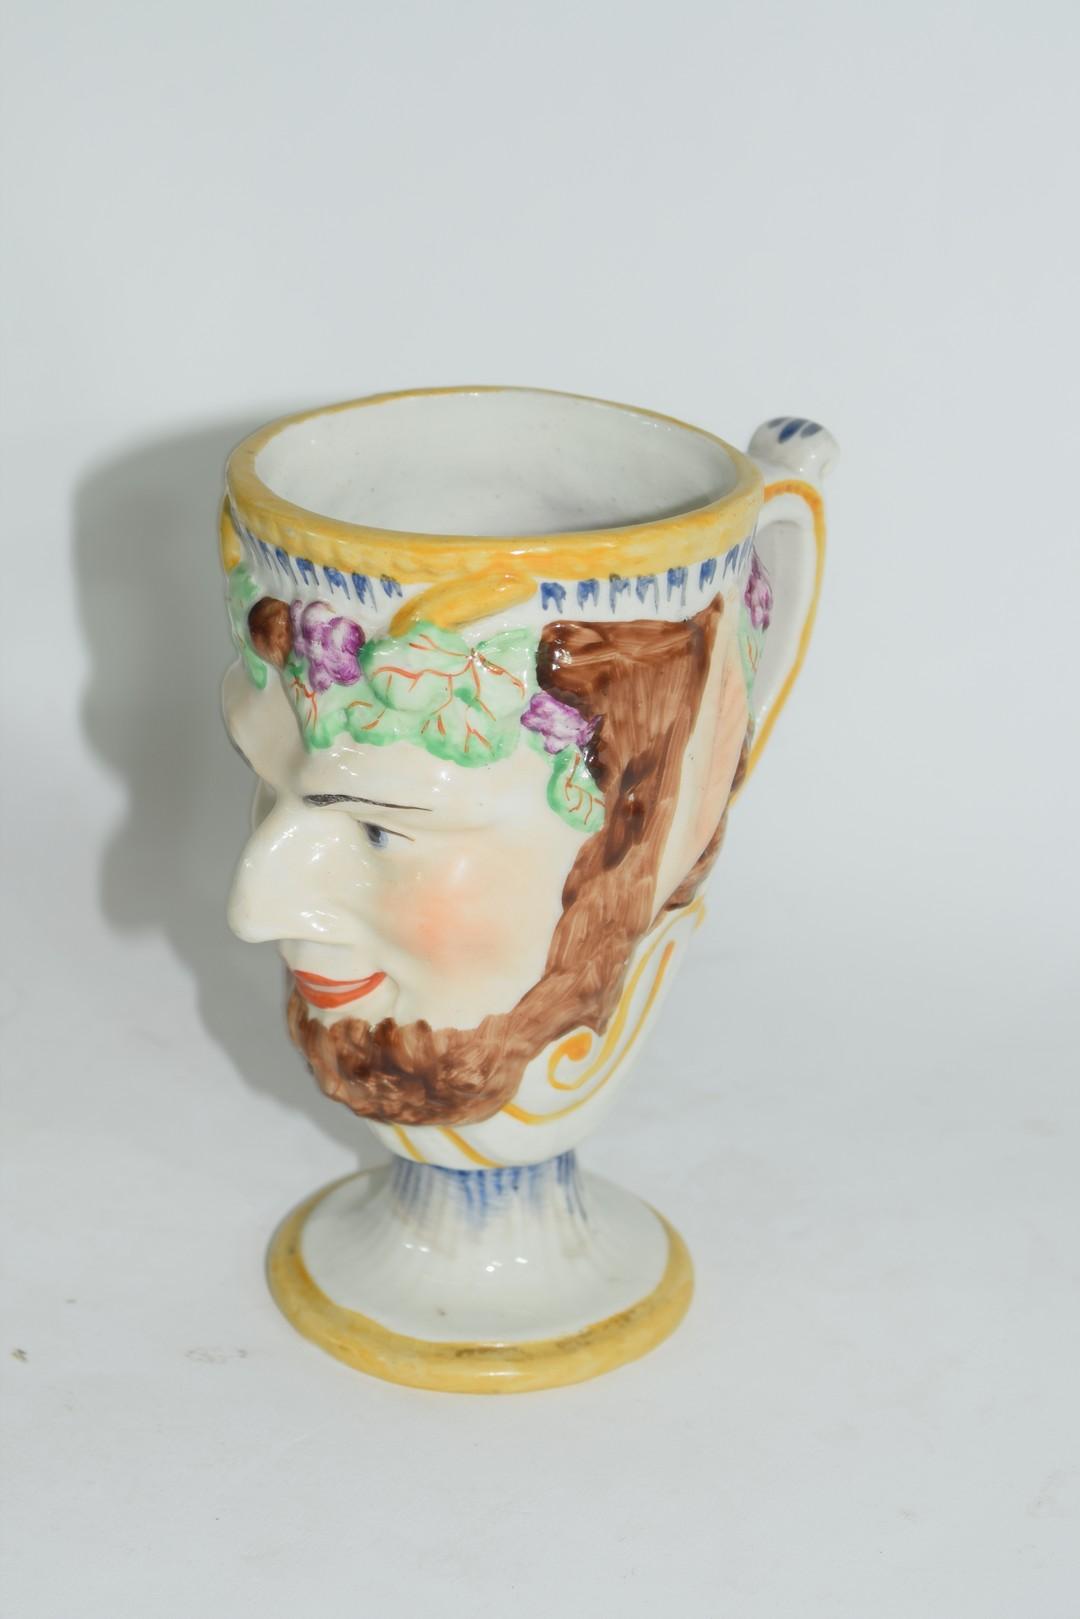 Late 19th century pearlware frog mug